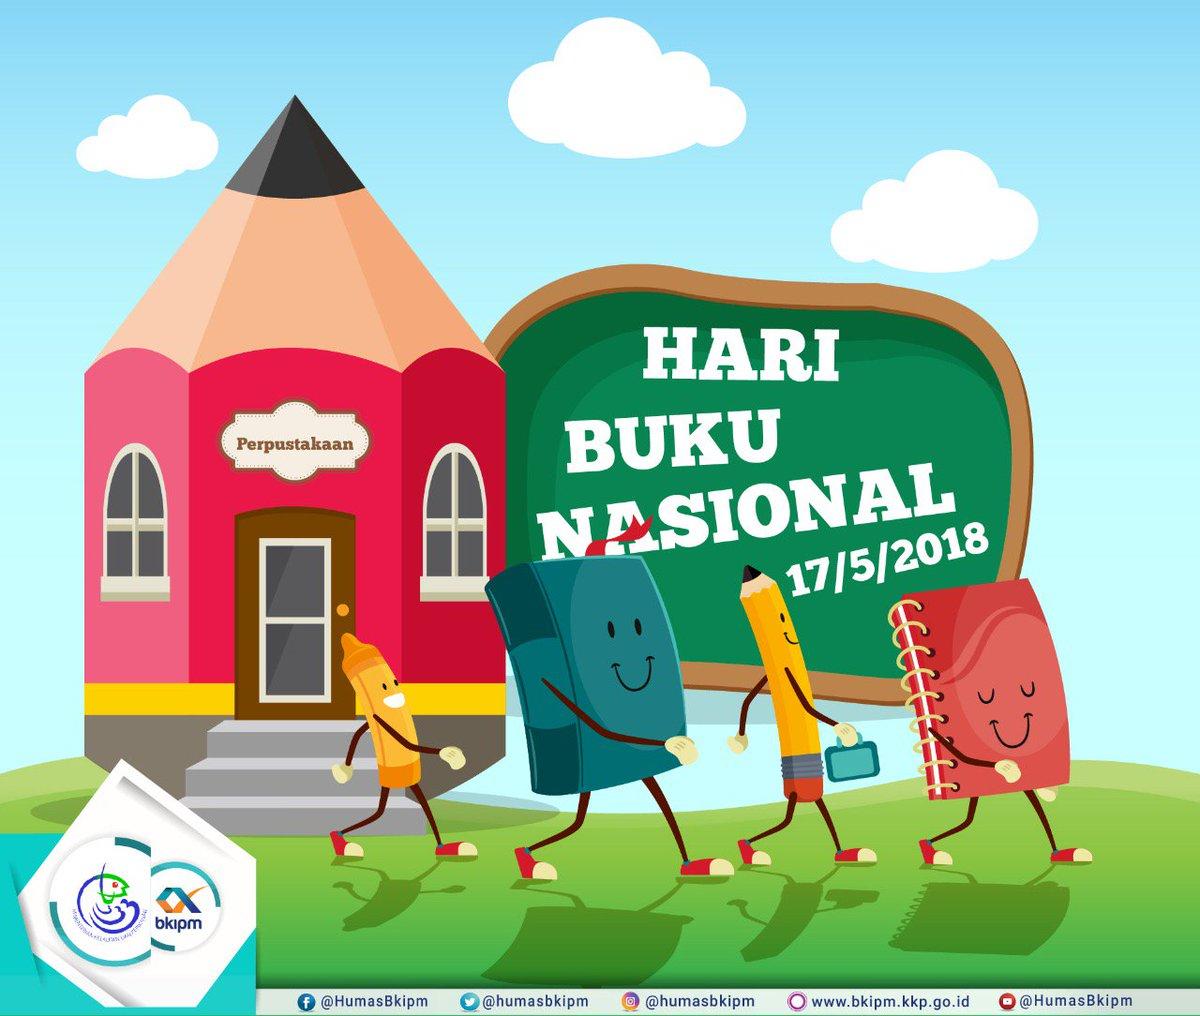 Bkipm V Twitter Selamat Hari Buku Nasional Sahabat Bahari